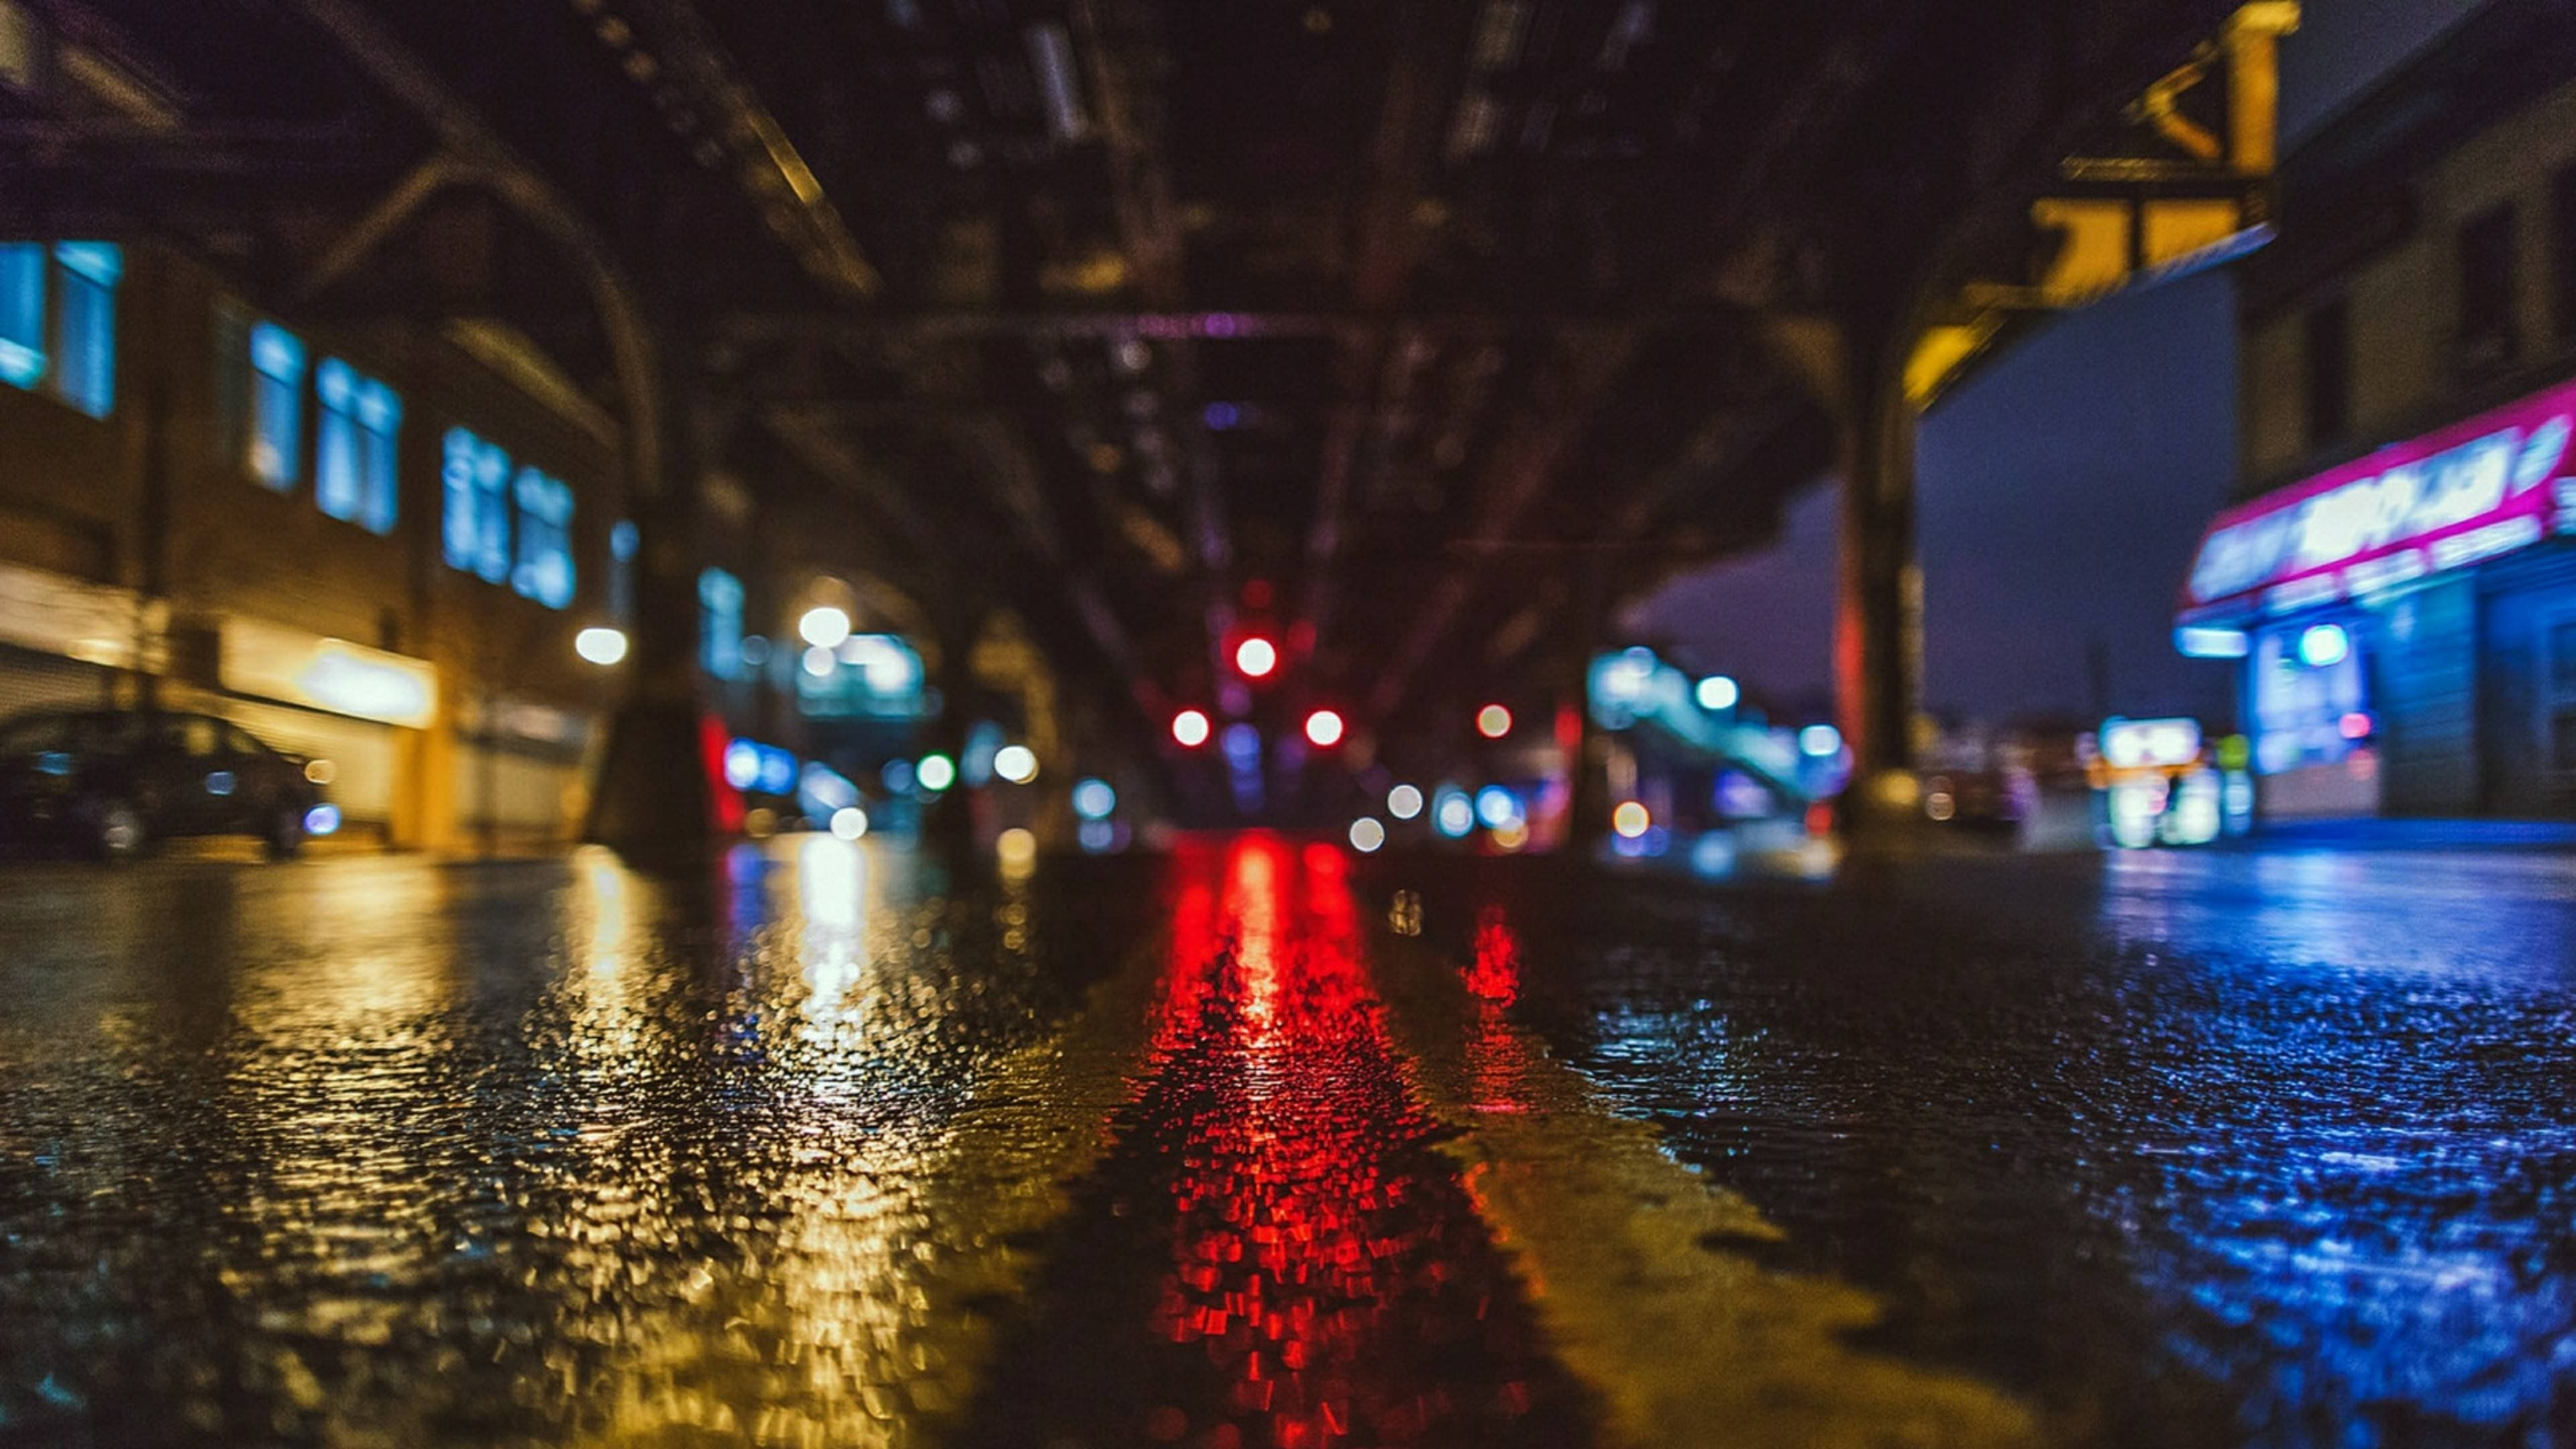 Streetlight 4k Wallpaper City Lights Wallpaper City Rain Cityscape